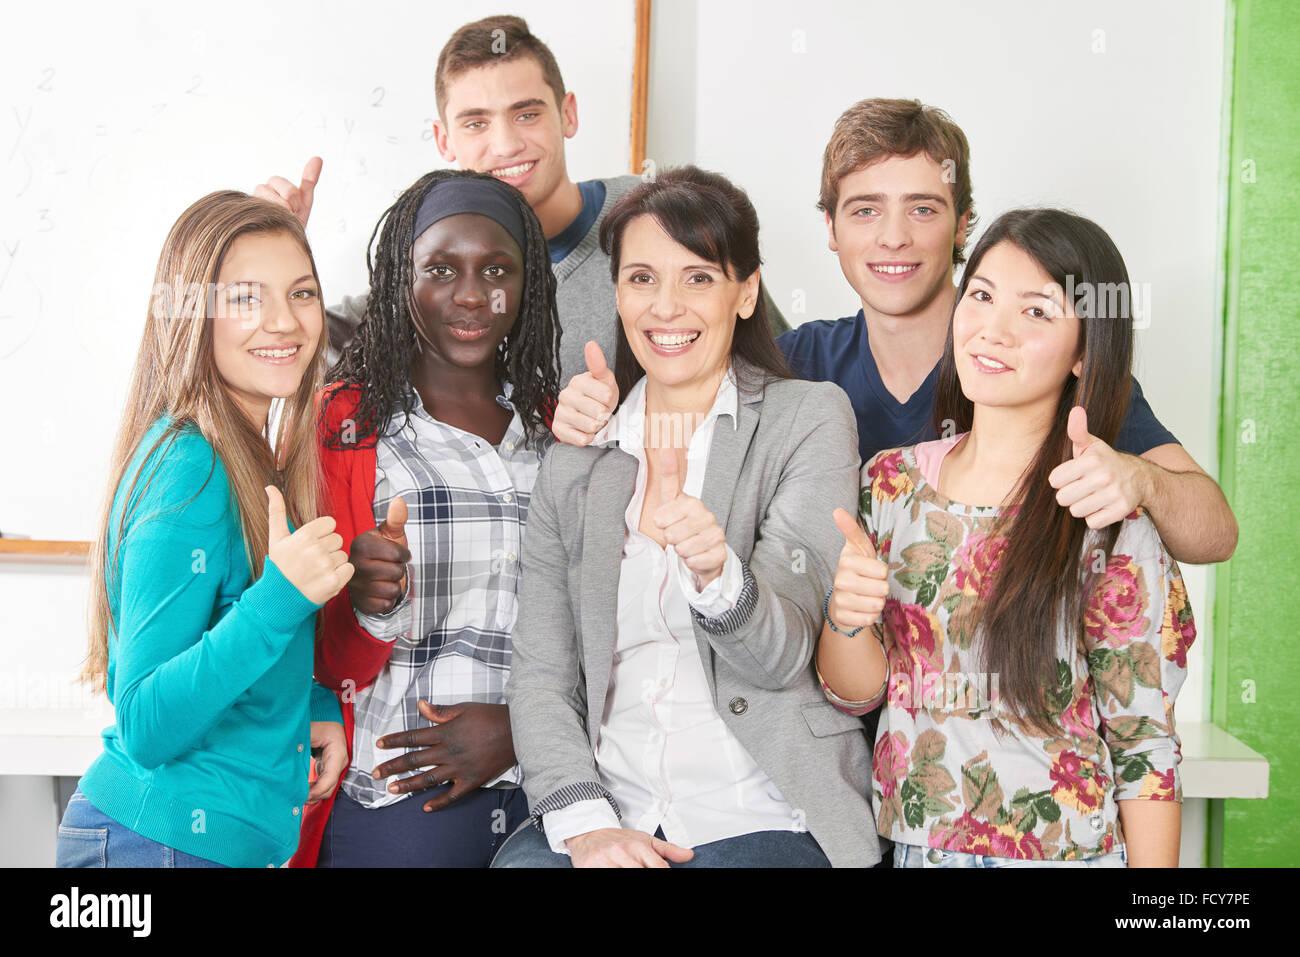 Students female interracial